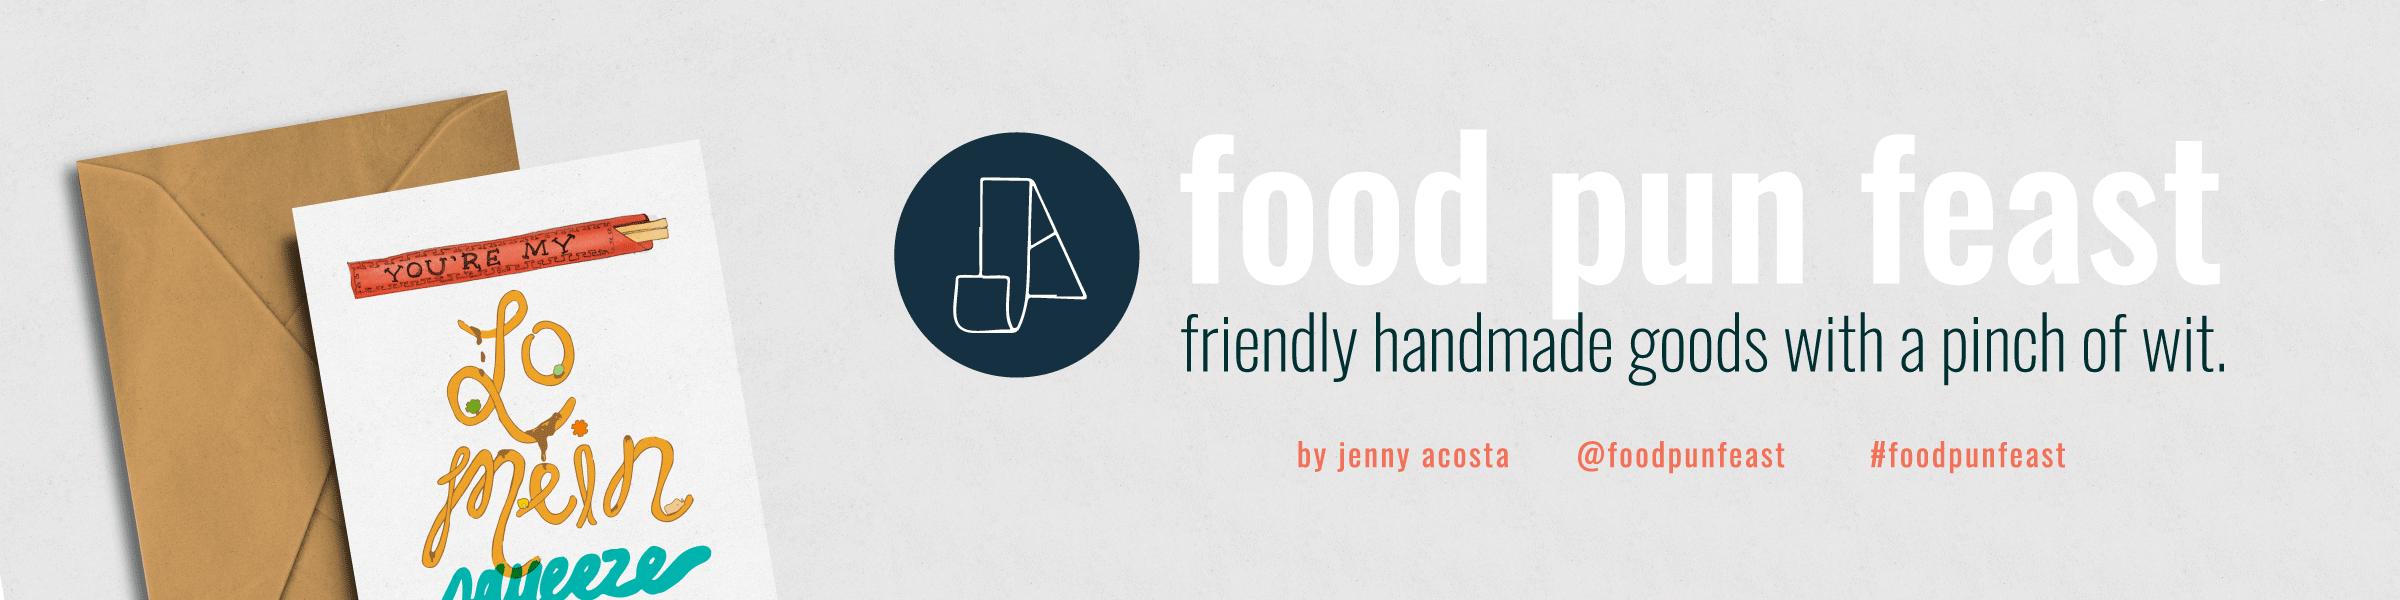 JennyAcosta-Food-Pun-Feast-Shop-Banner